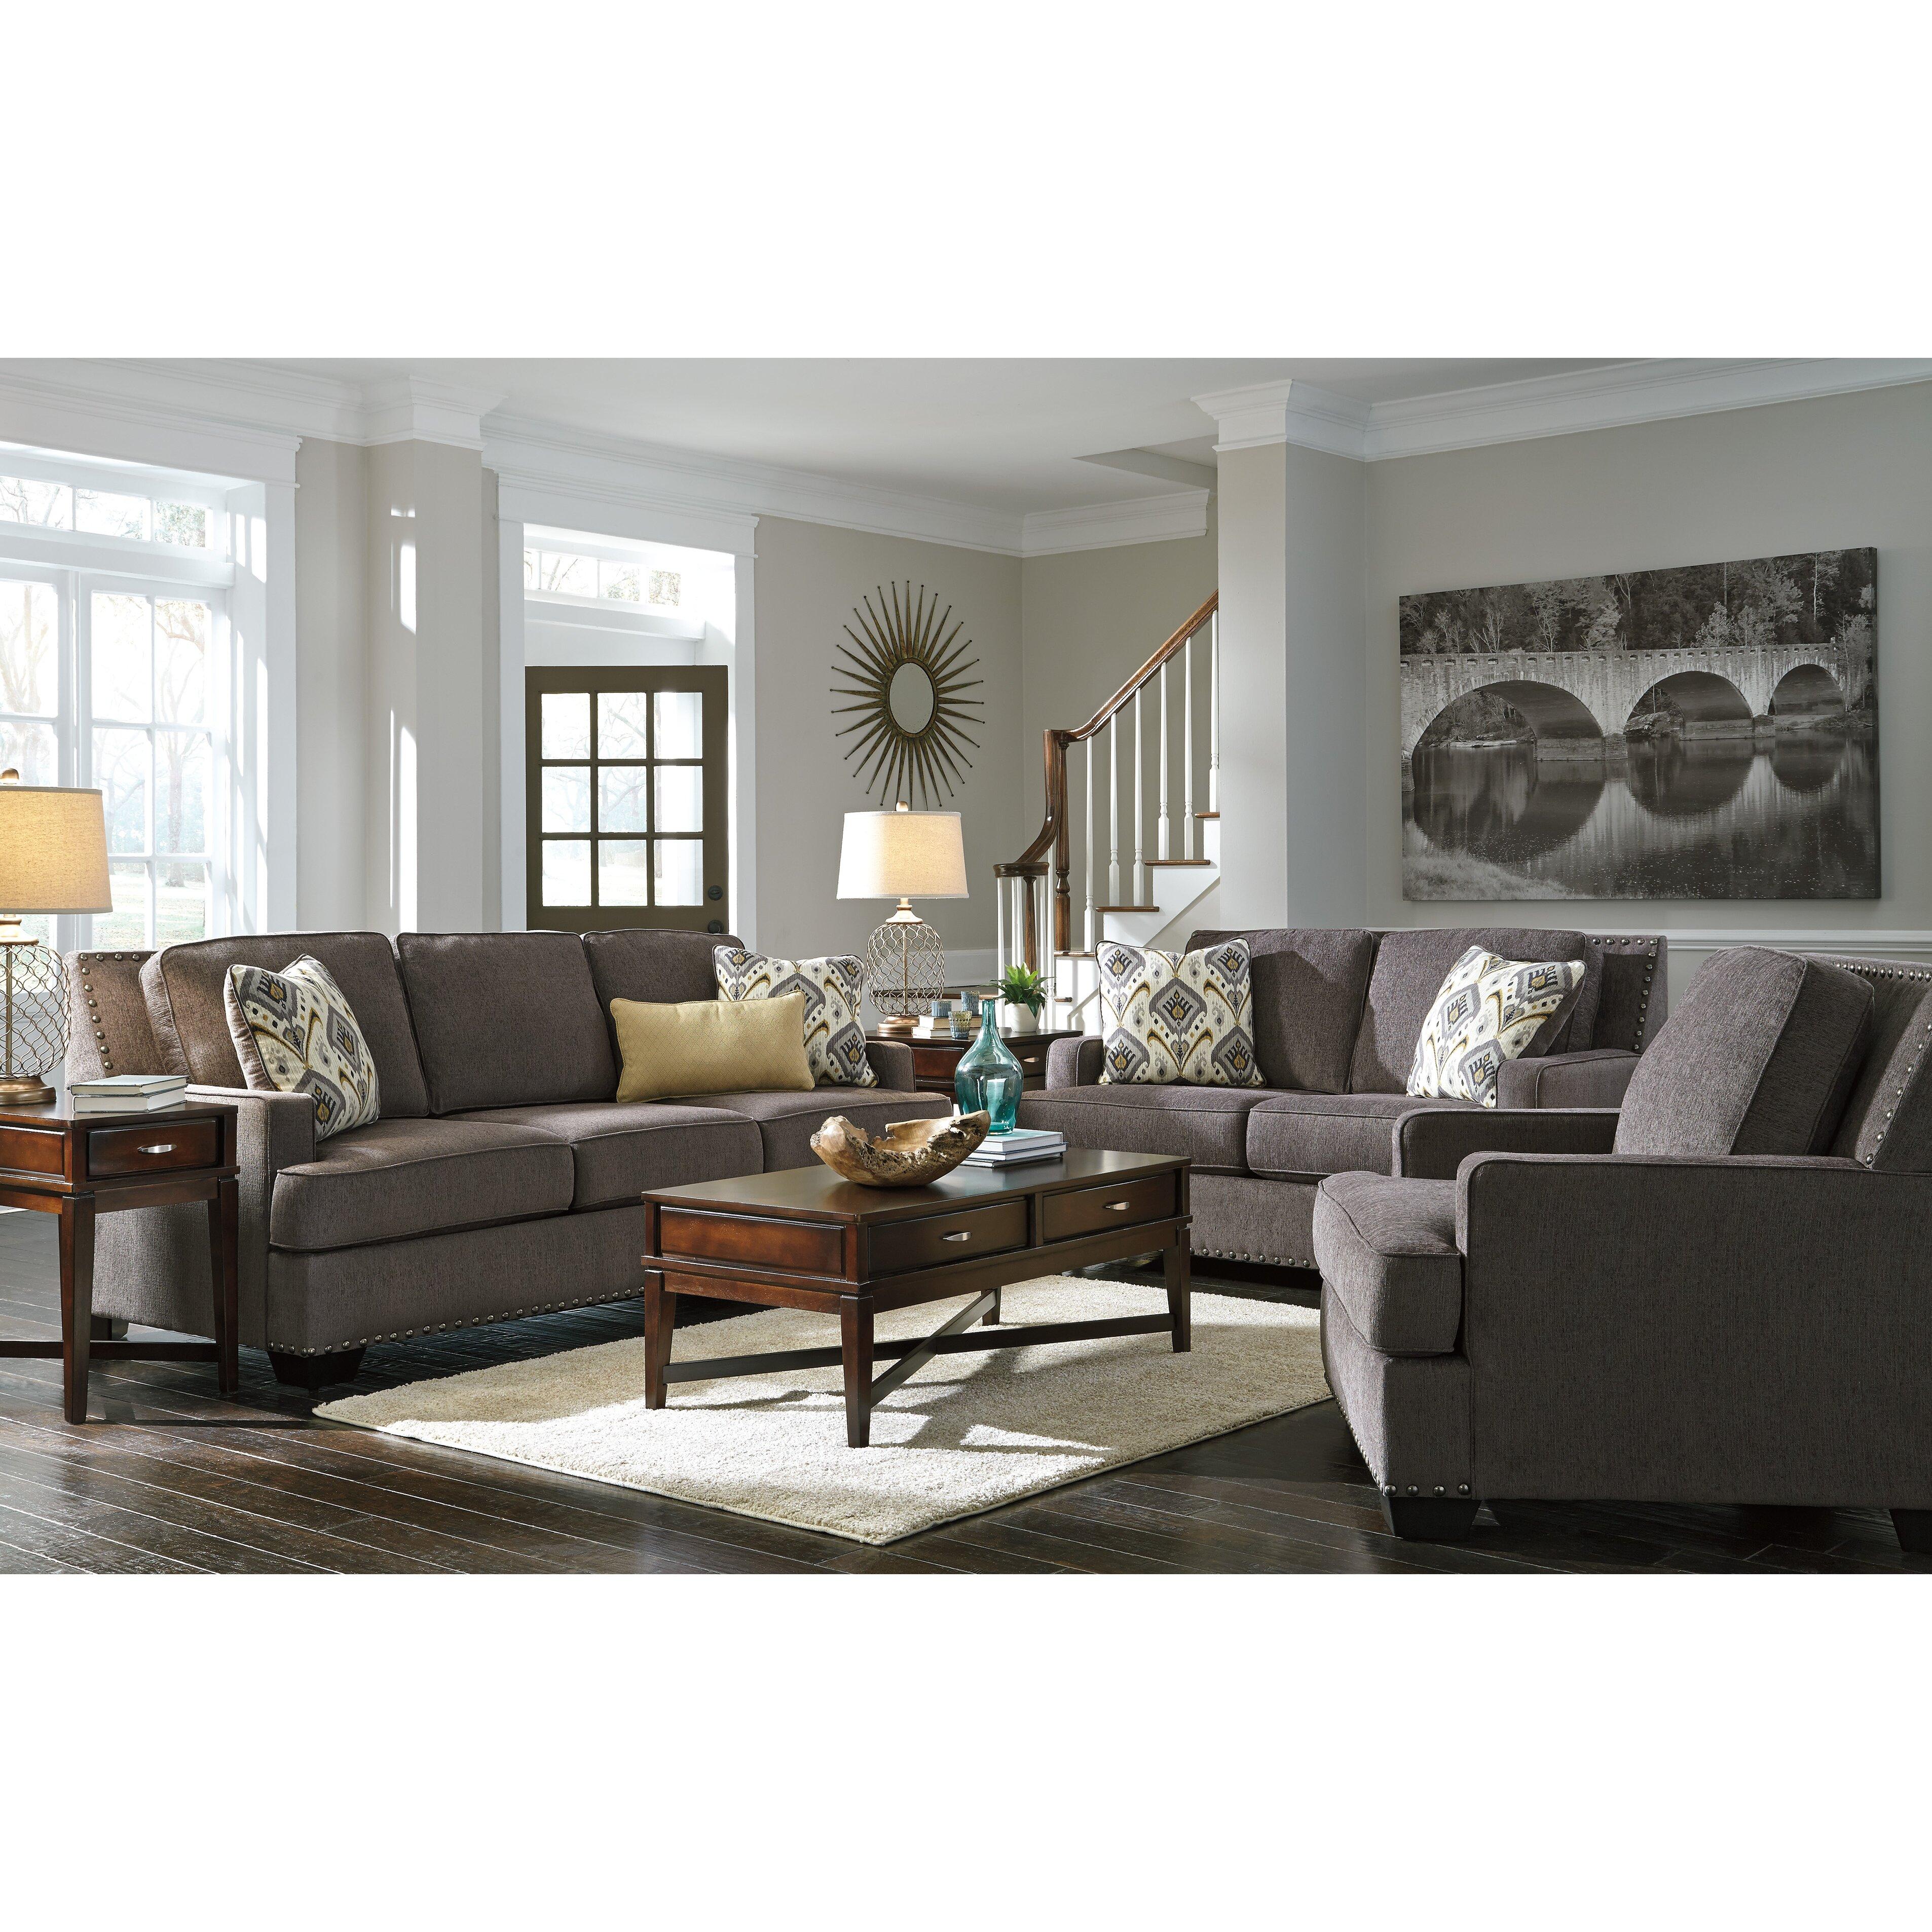 Benchcraft Barinteen Sofa Reviews Wayfair